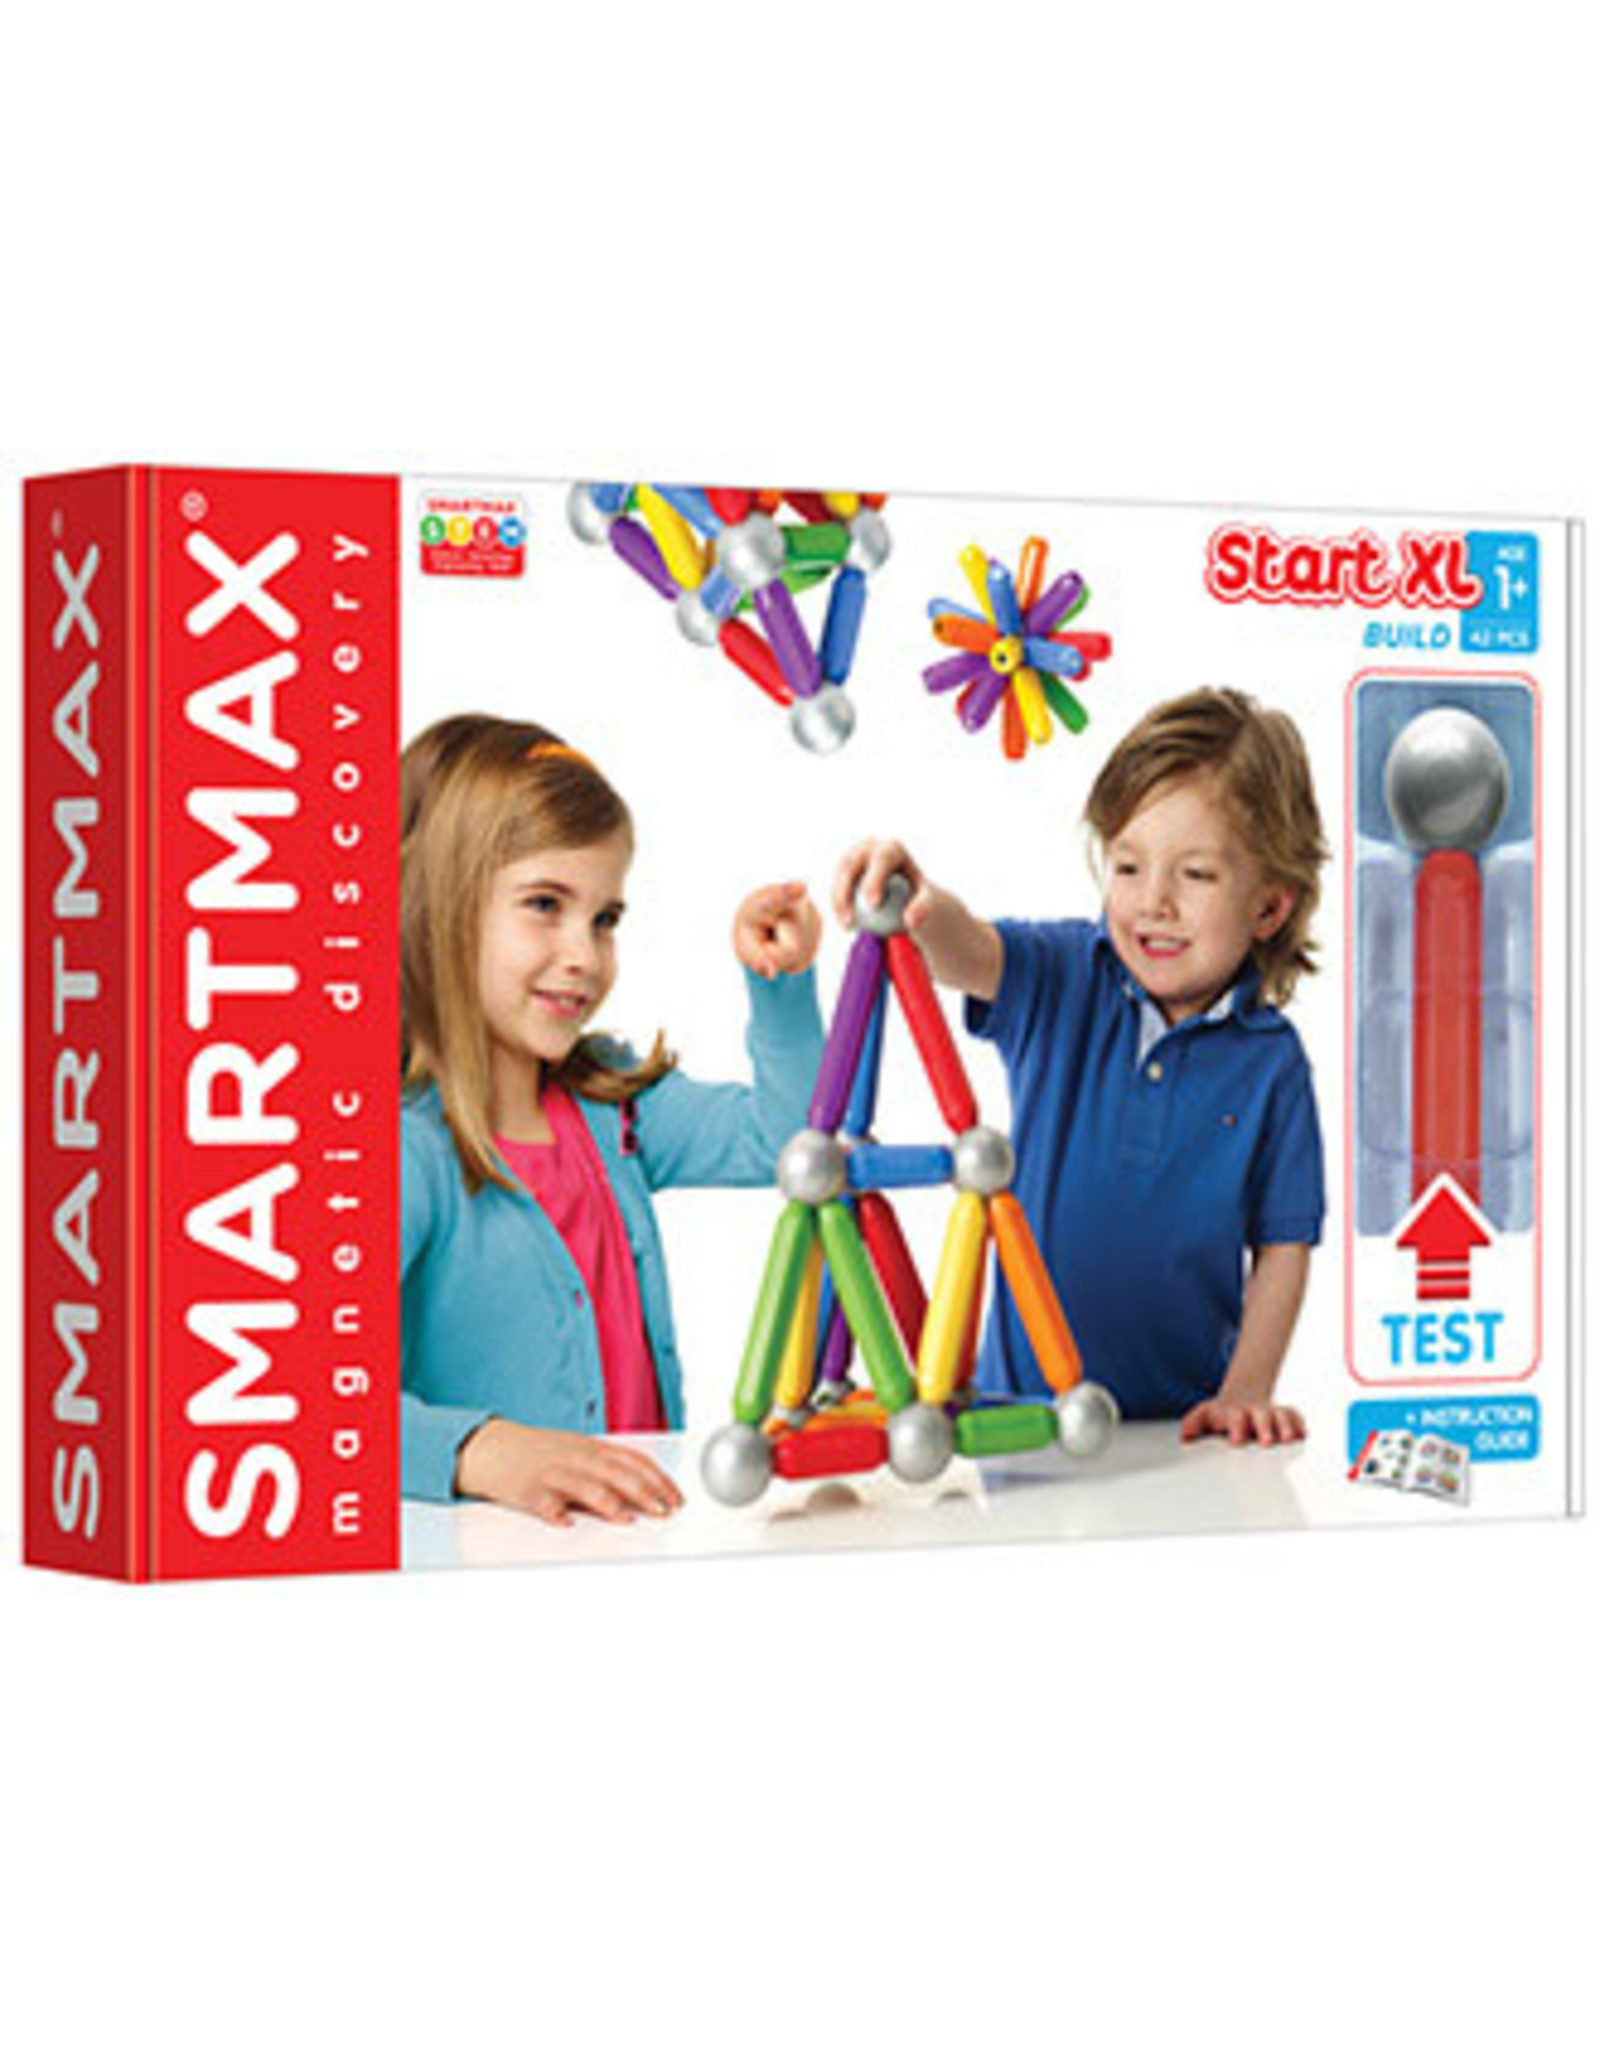 SmartMax SmartMax Basic Set - Start XL